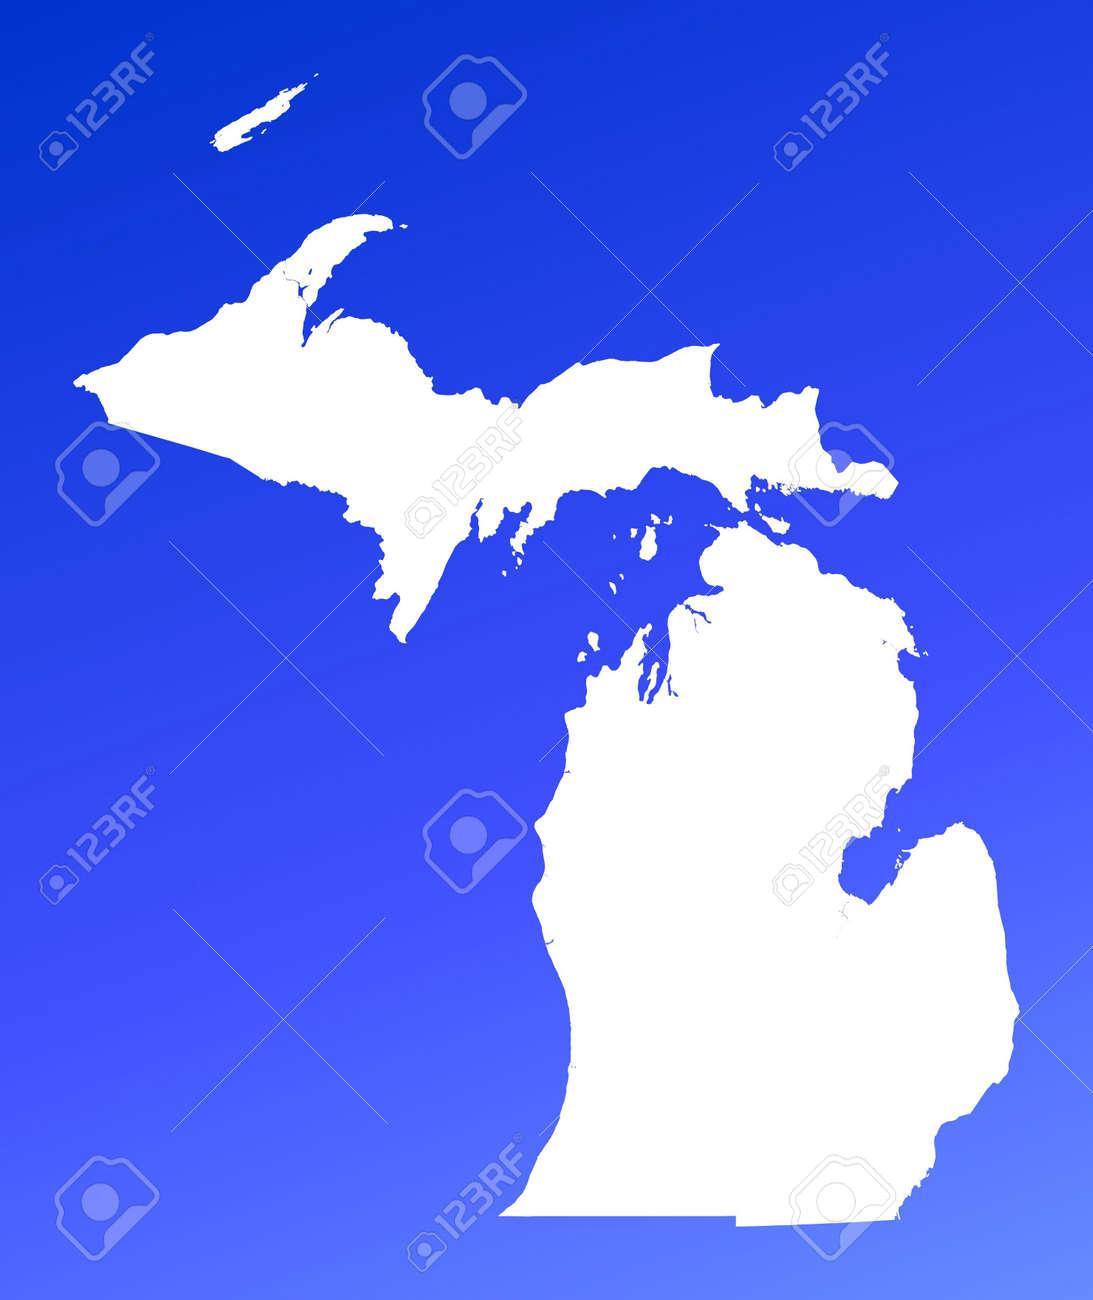 Michiganusa Map On Blue Gradient Background High Resolution Map Of Usa Michigan